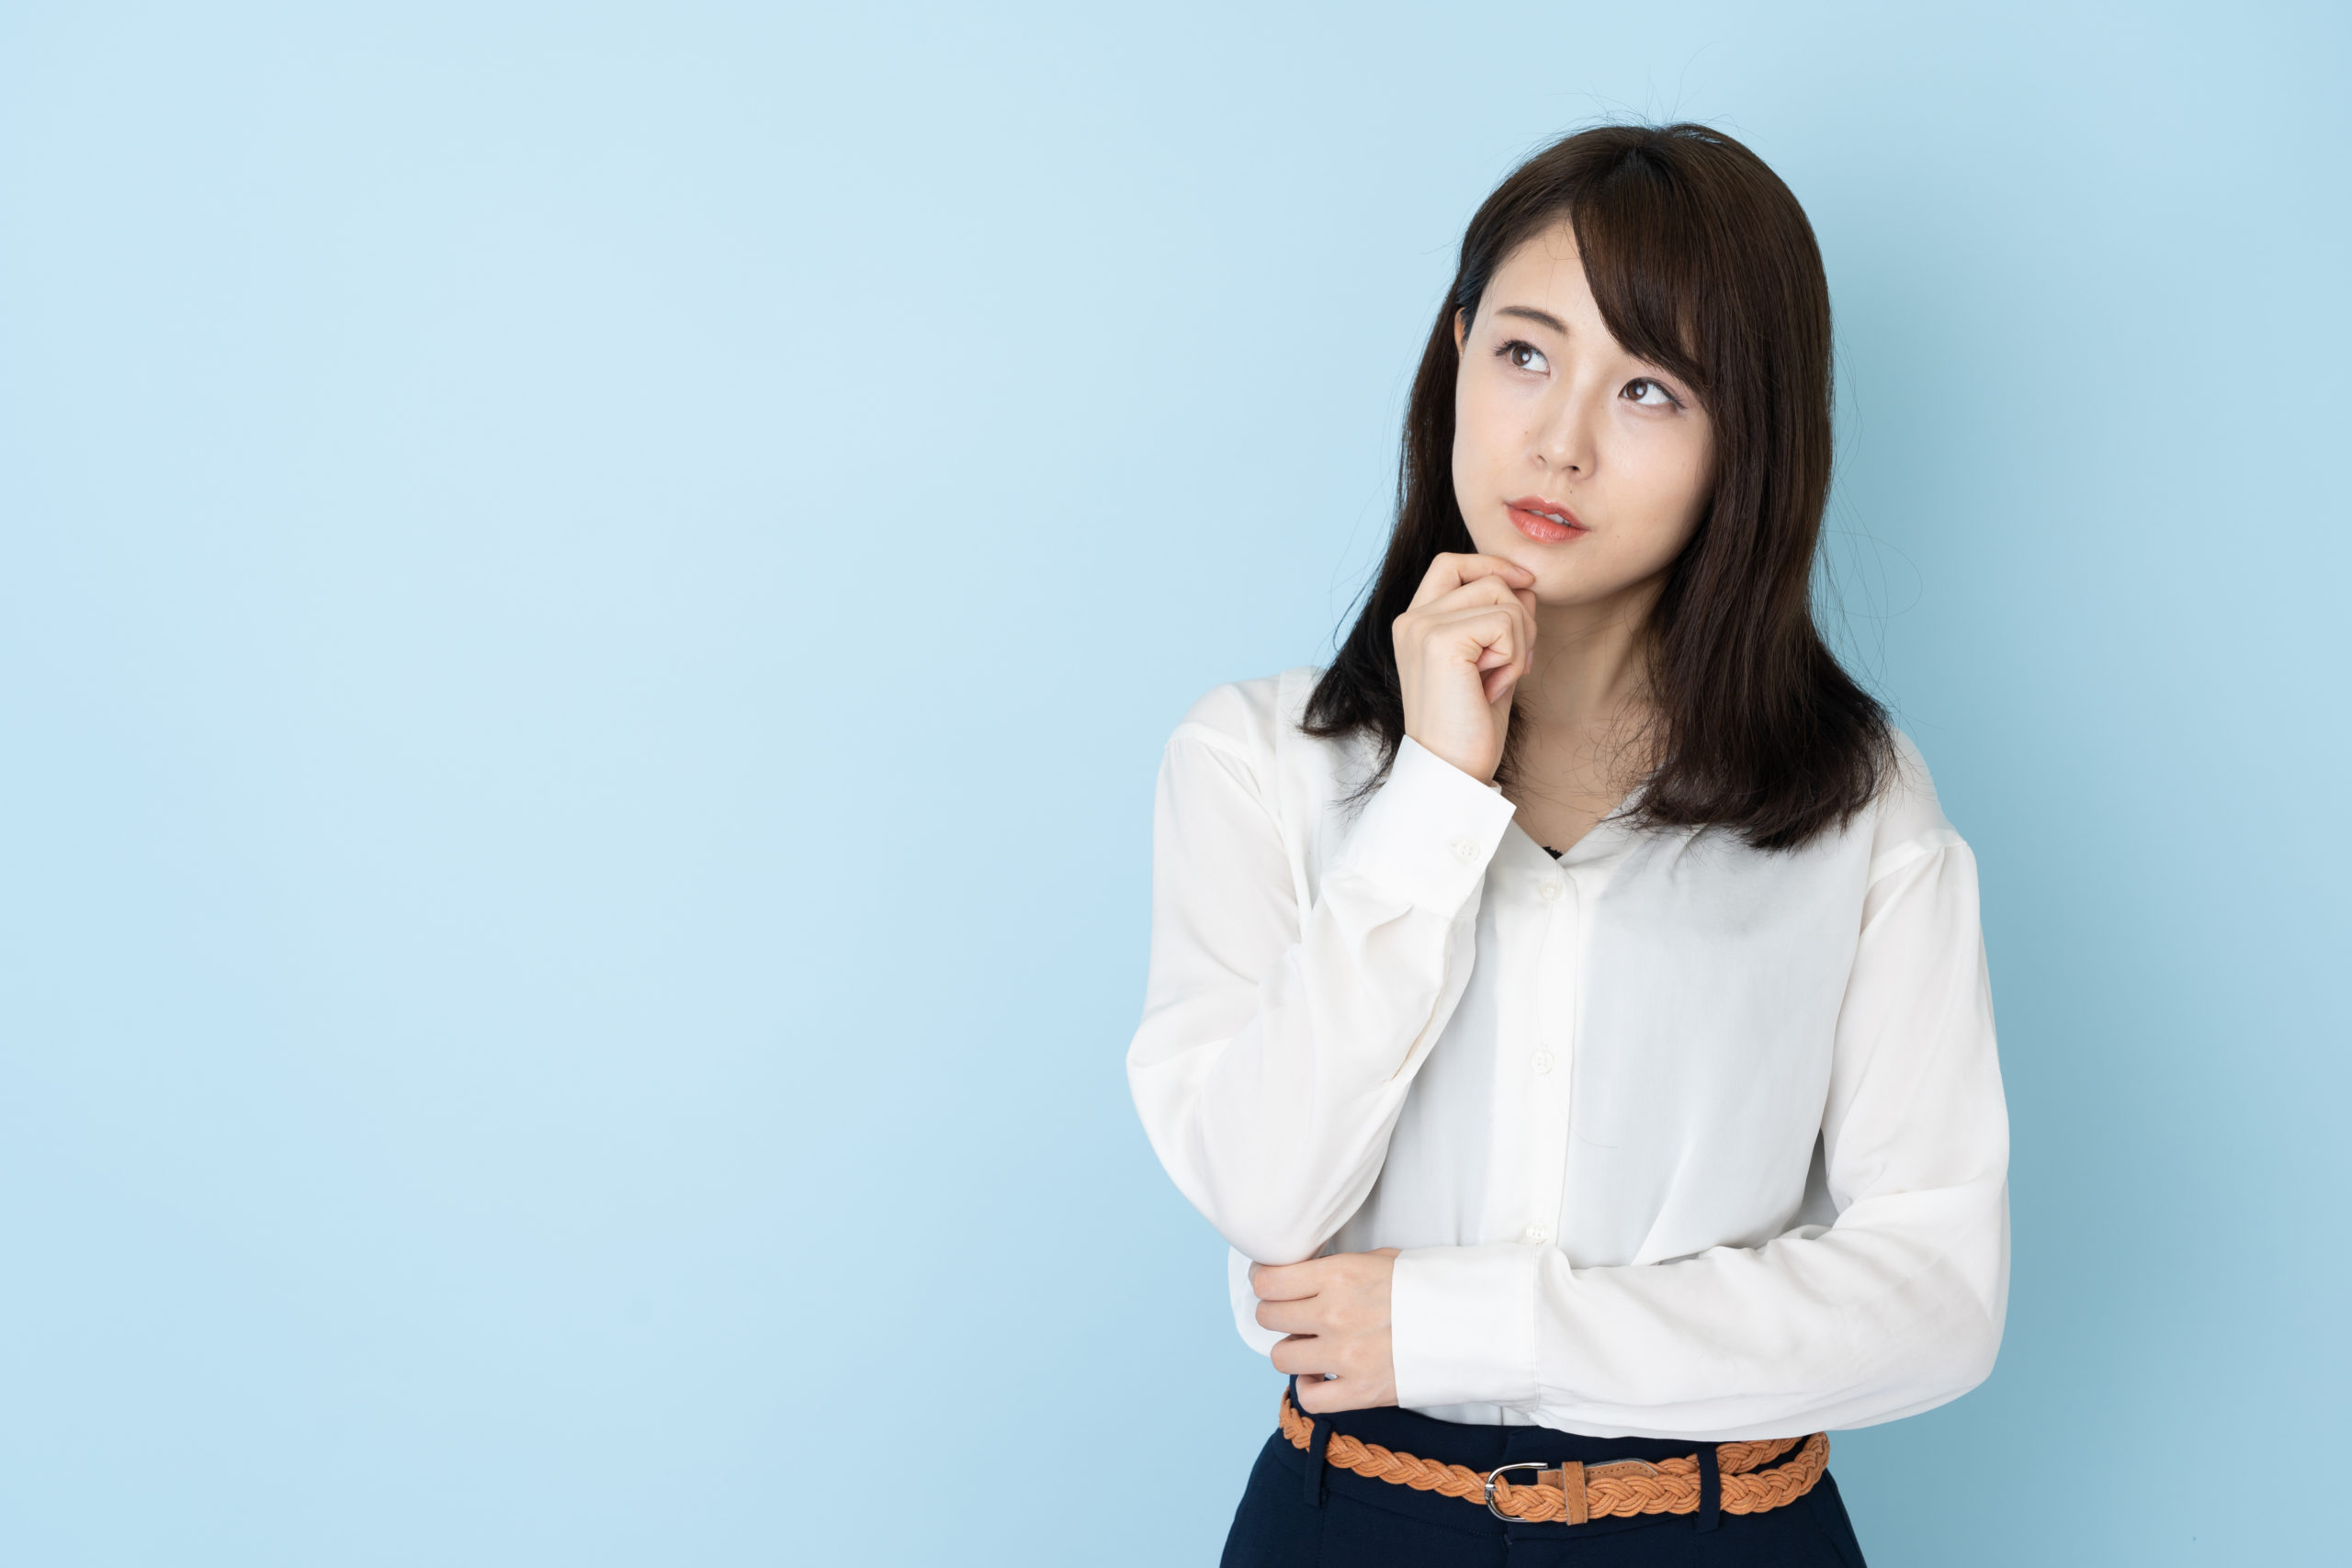 portrait-attractive-asian-woman-on-blue-1194616651